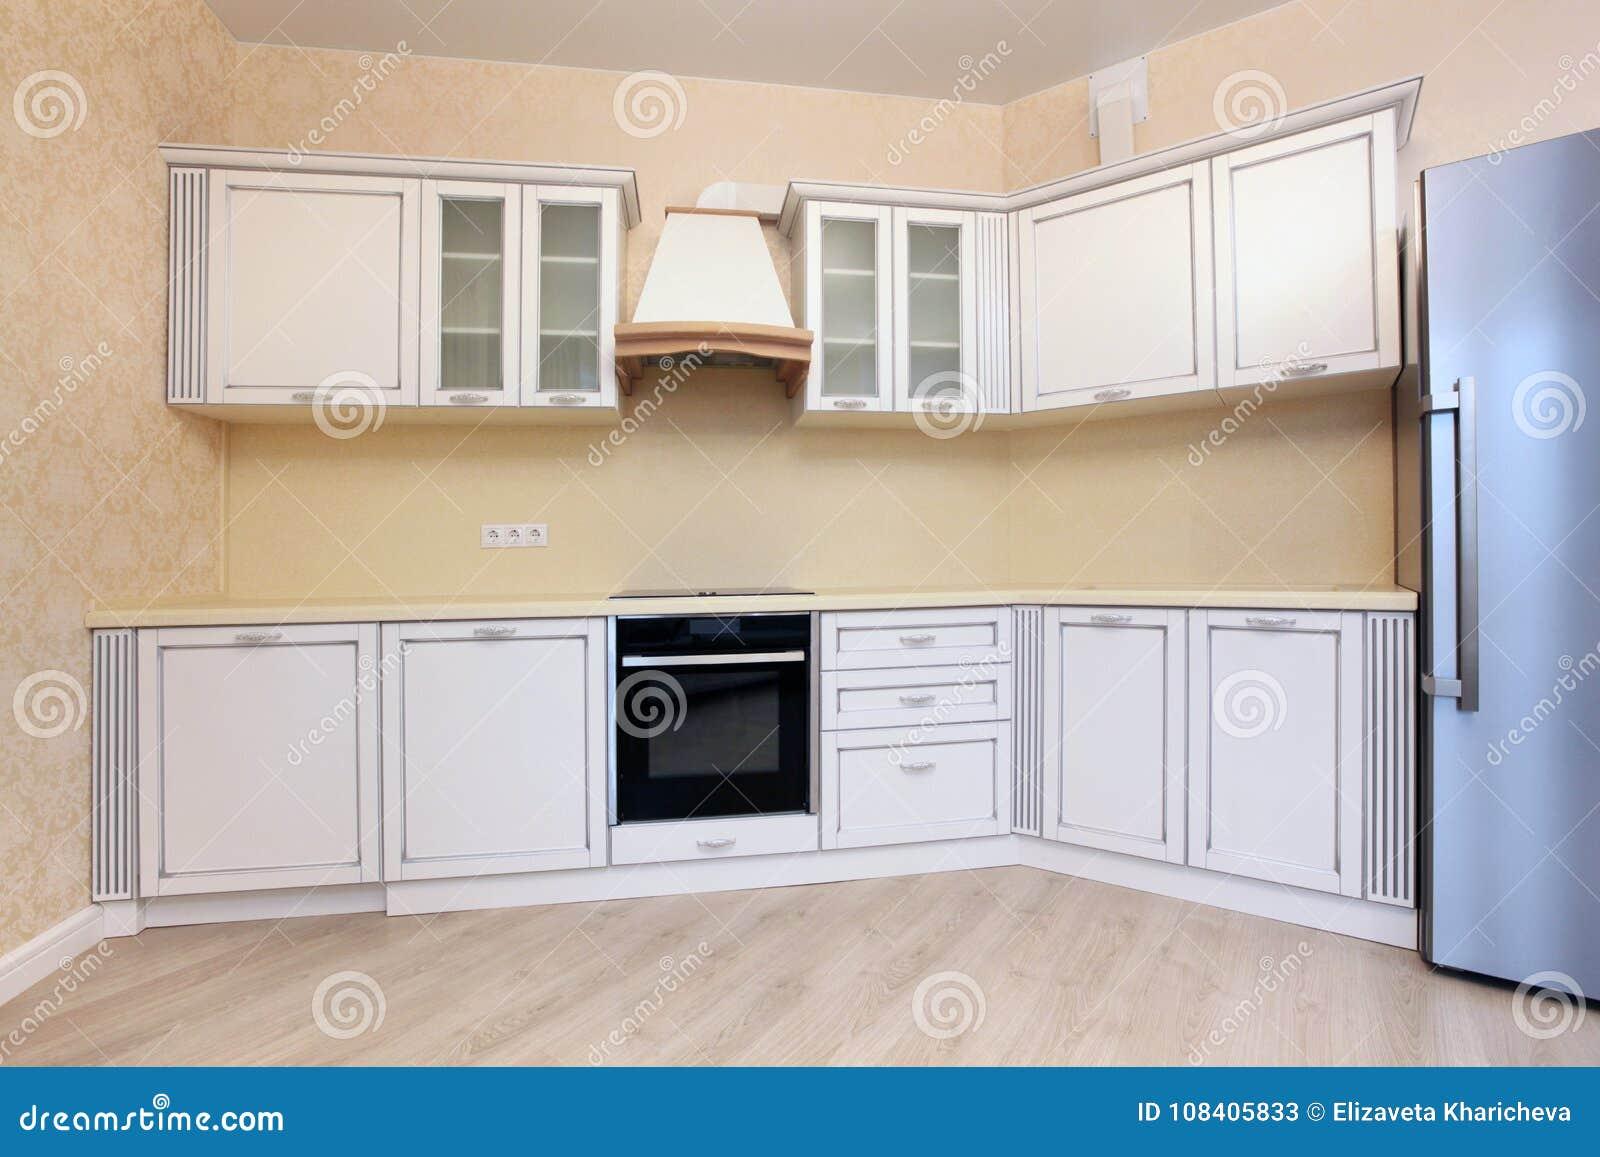 Corner Bright Kitchen And Fridge Stock Image Image Of Empty